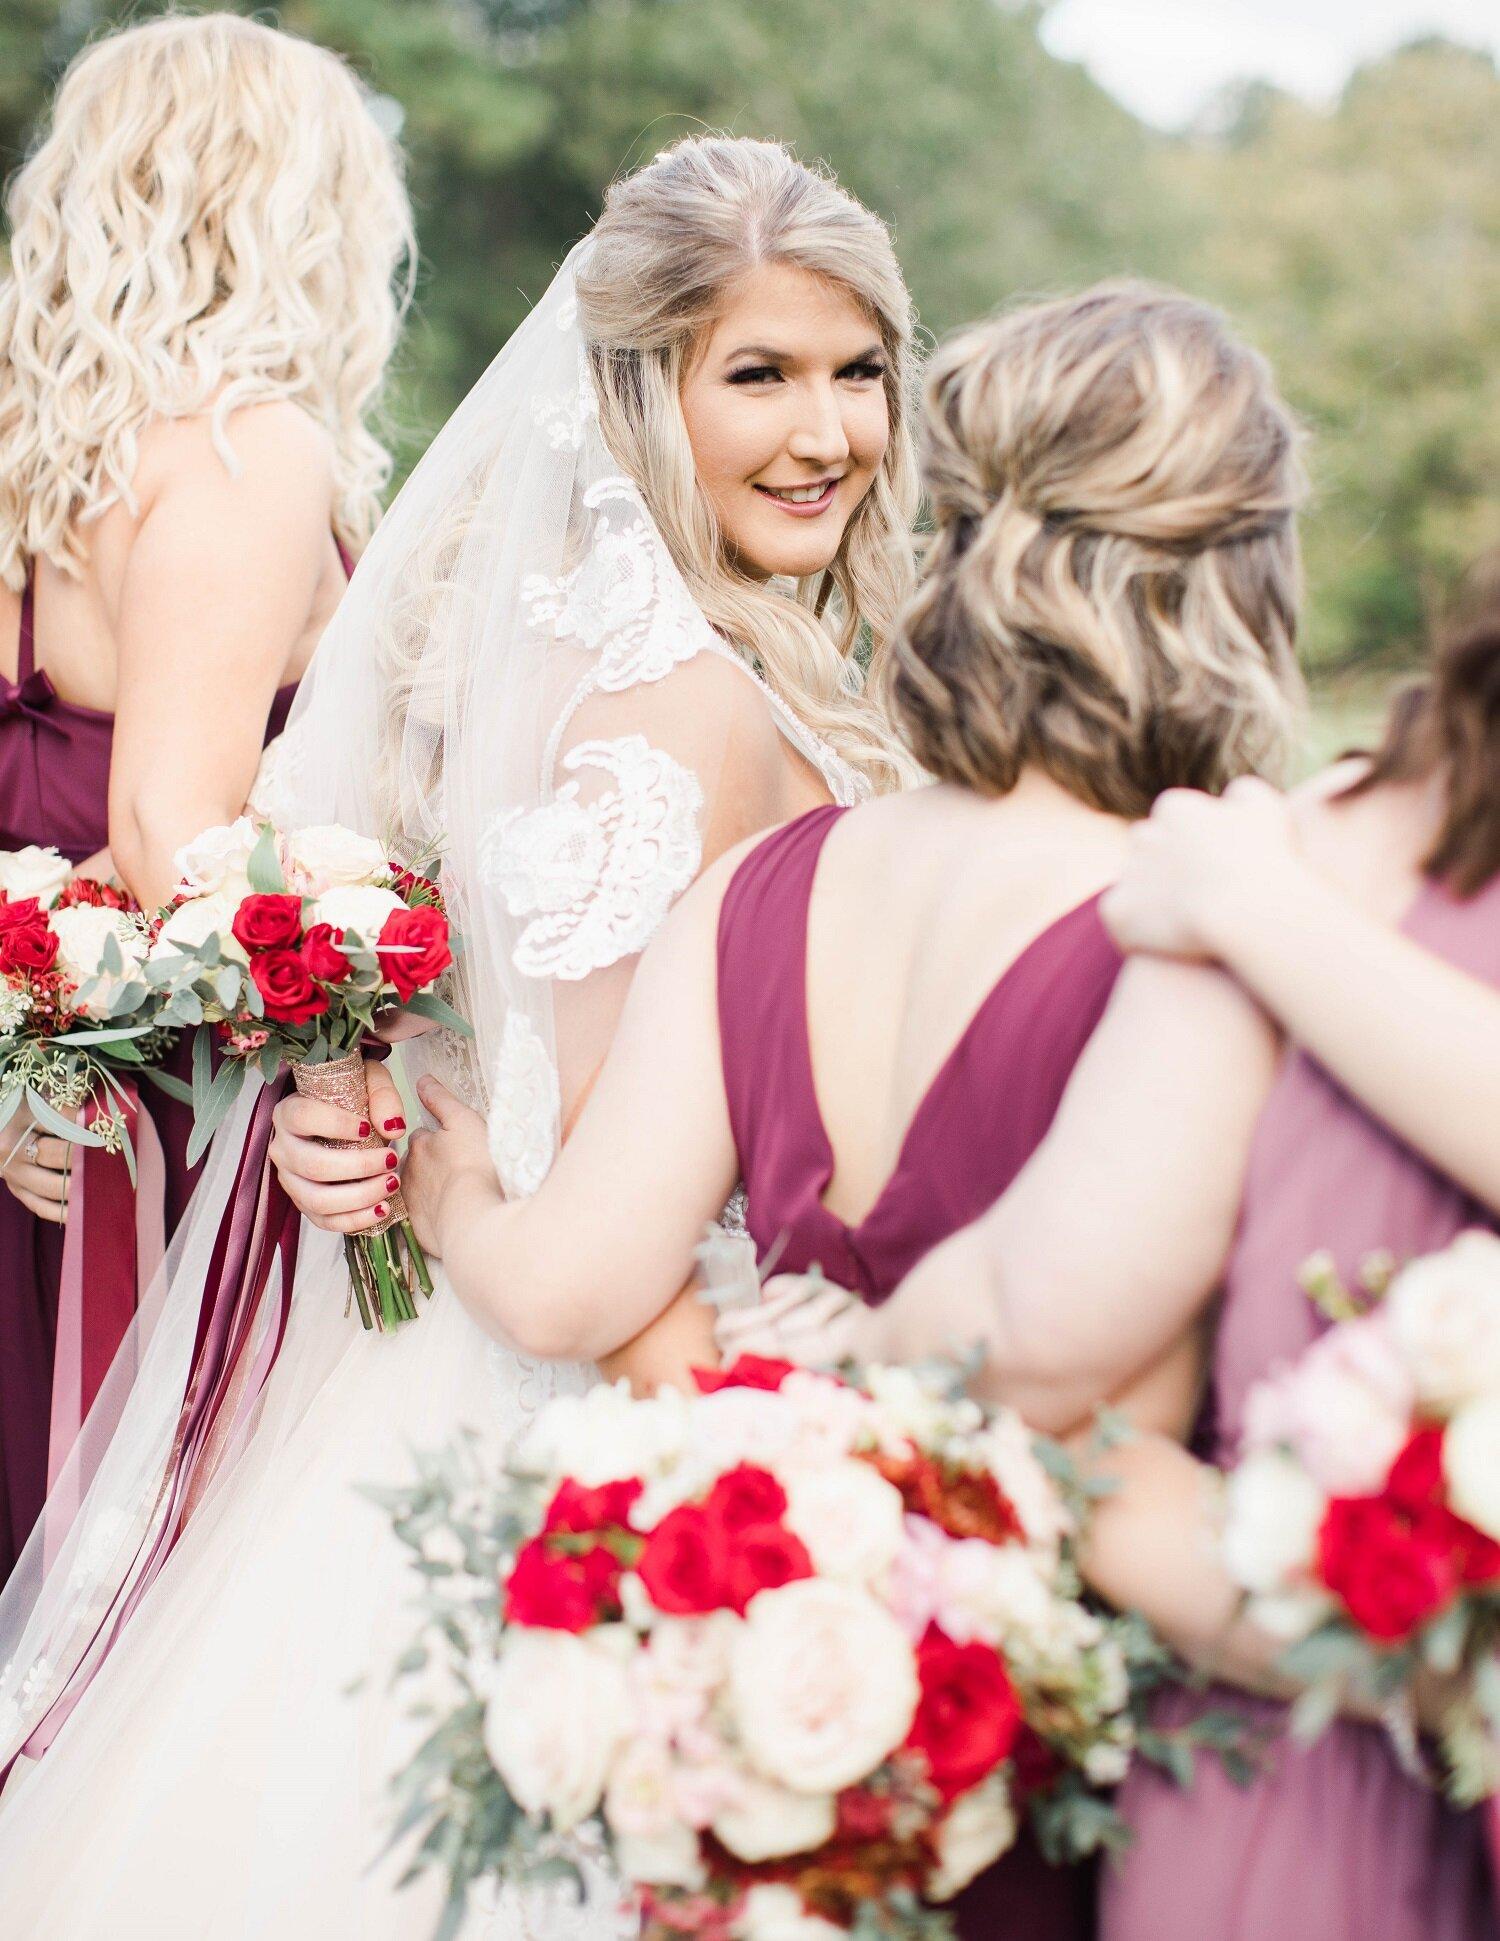 Martino Wedding - Shea's Favorites_-77.jpg